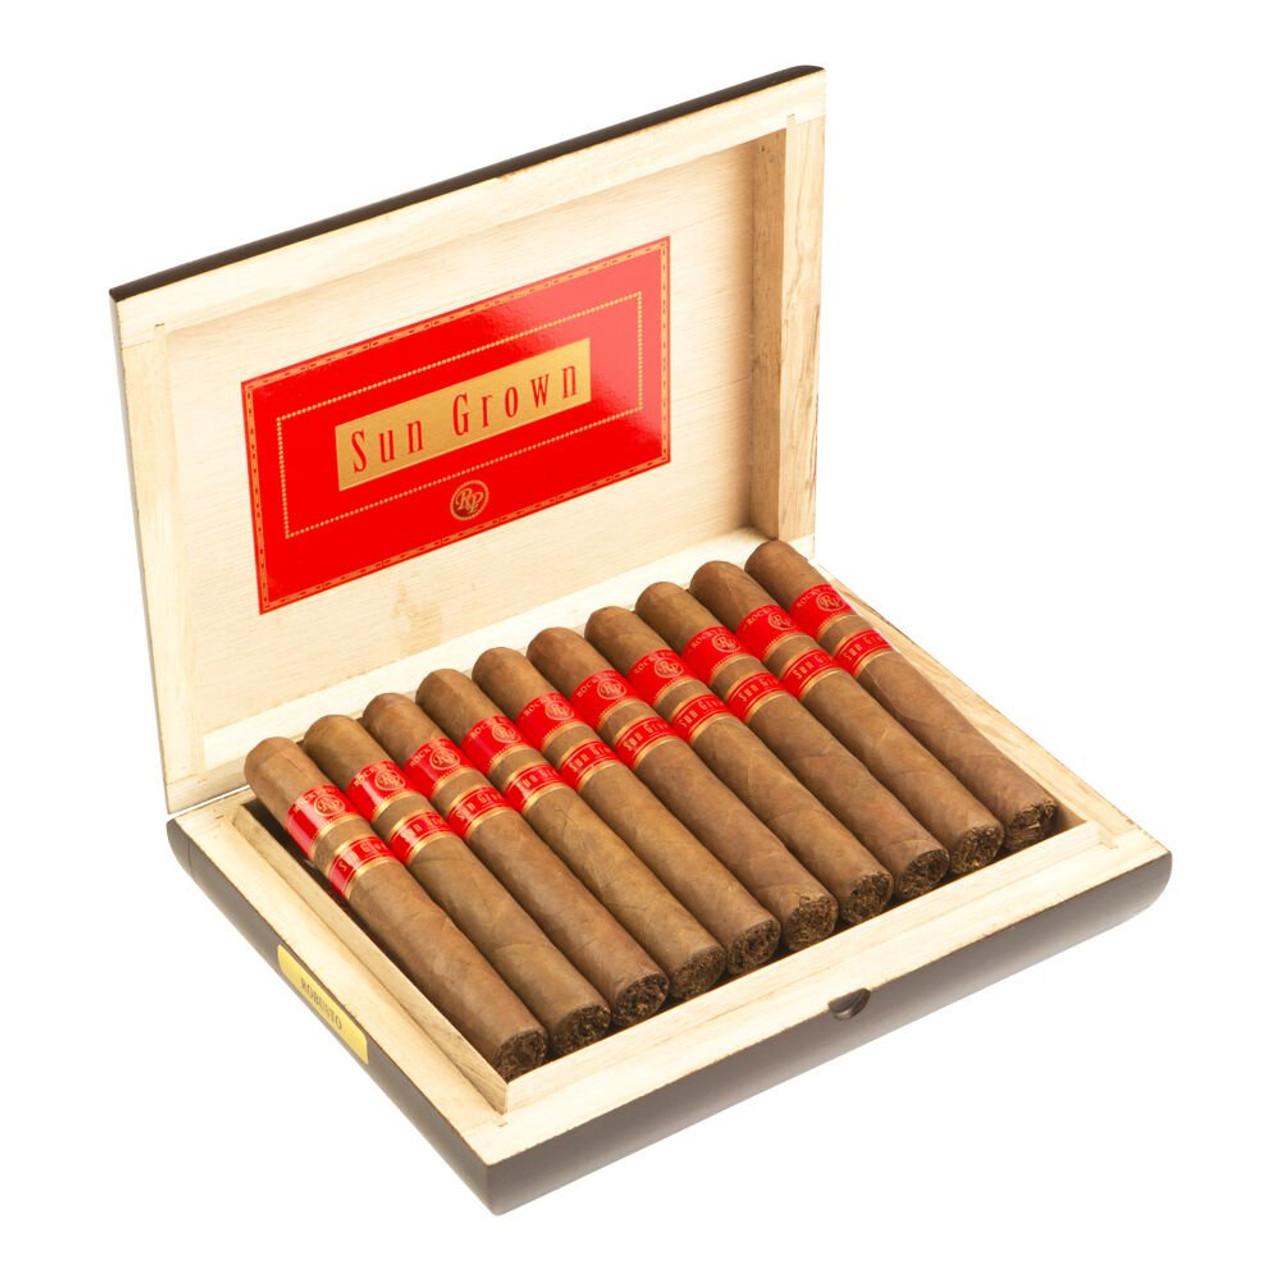 Rocky Patel Sun Grown Toro Cigars - 6.5 x 52 (Box of 20)